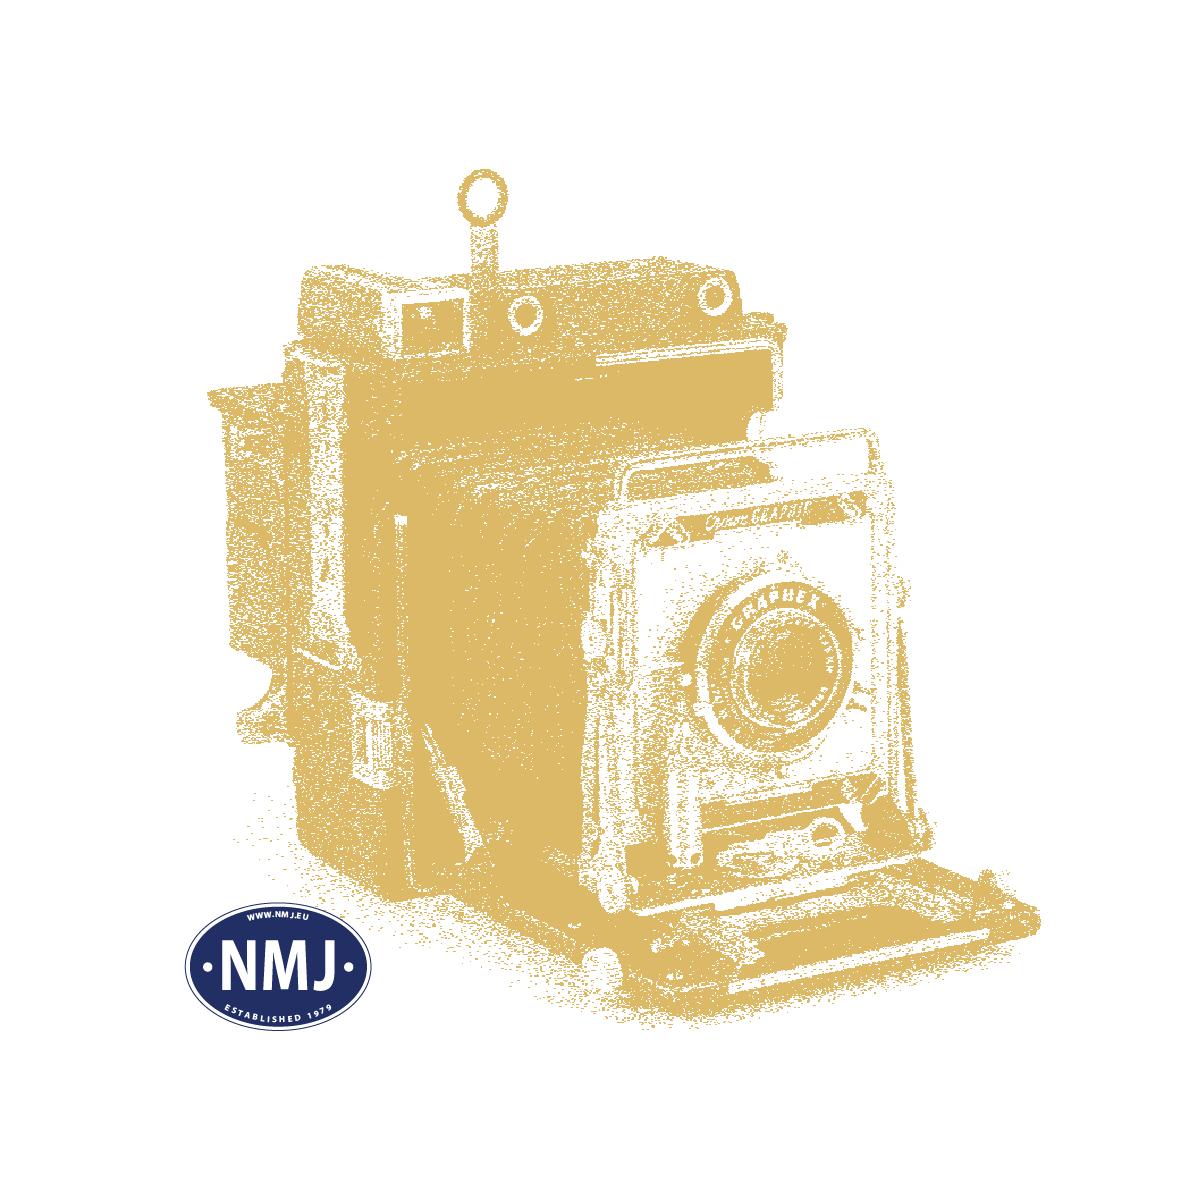 NMJT90501 - NMJ Topline TÅGAB TMY 101, DCC m/ Lyd (NMJT91501)